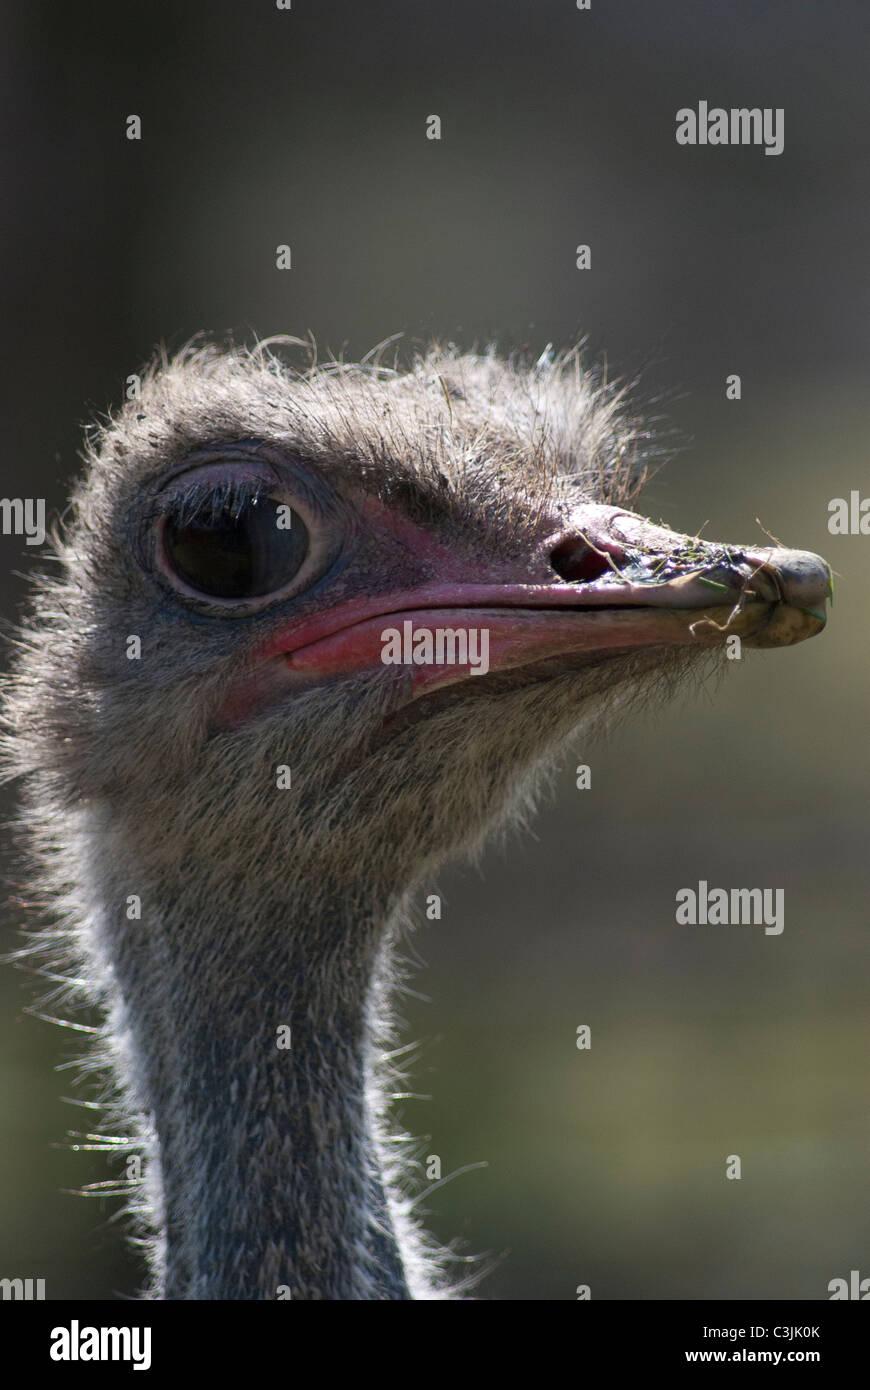 Close up of an Ostridge head - Stock Image